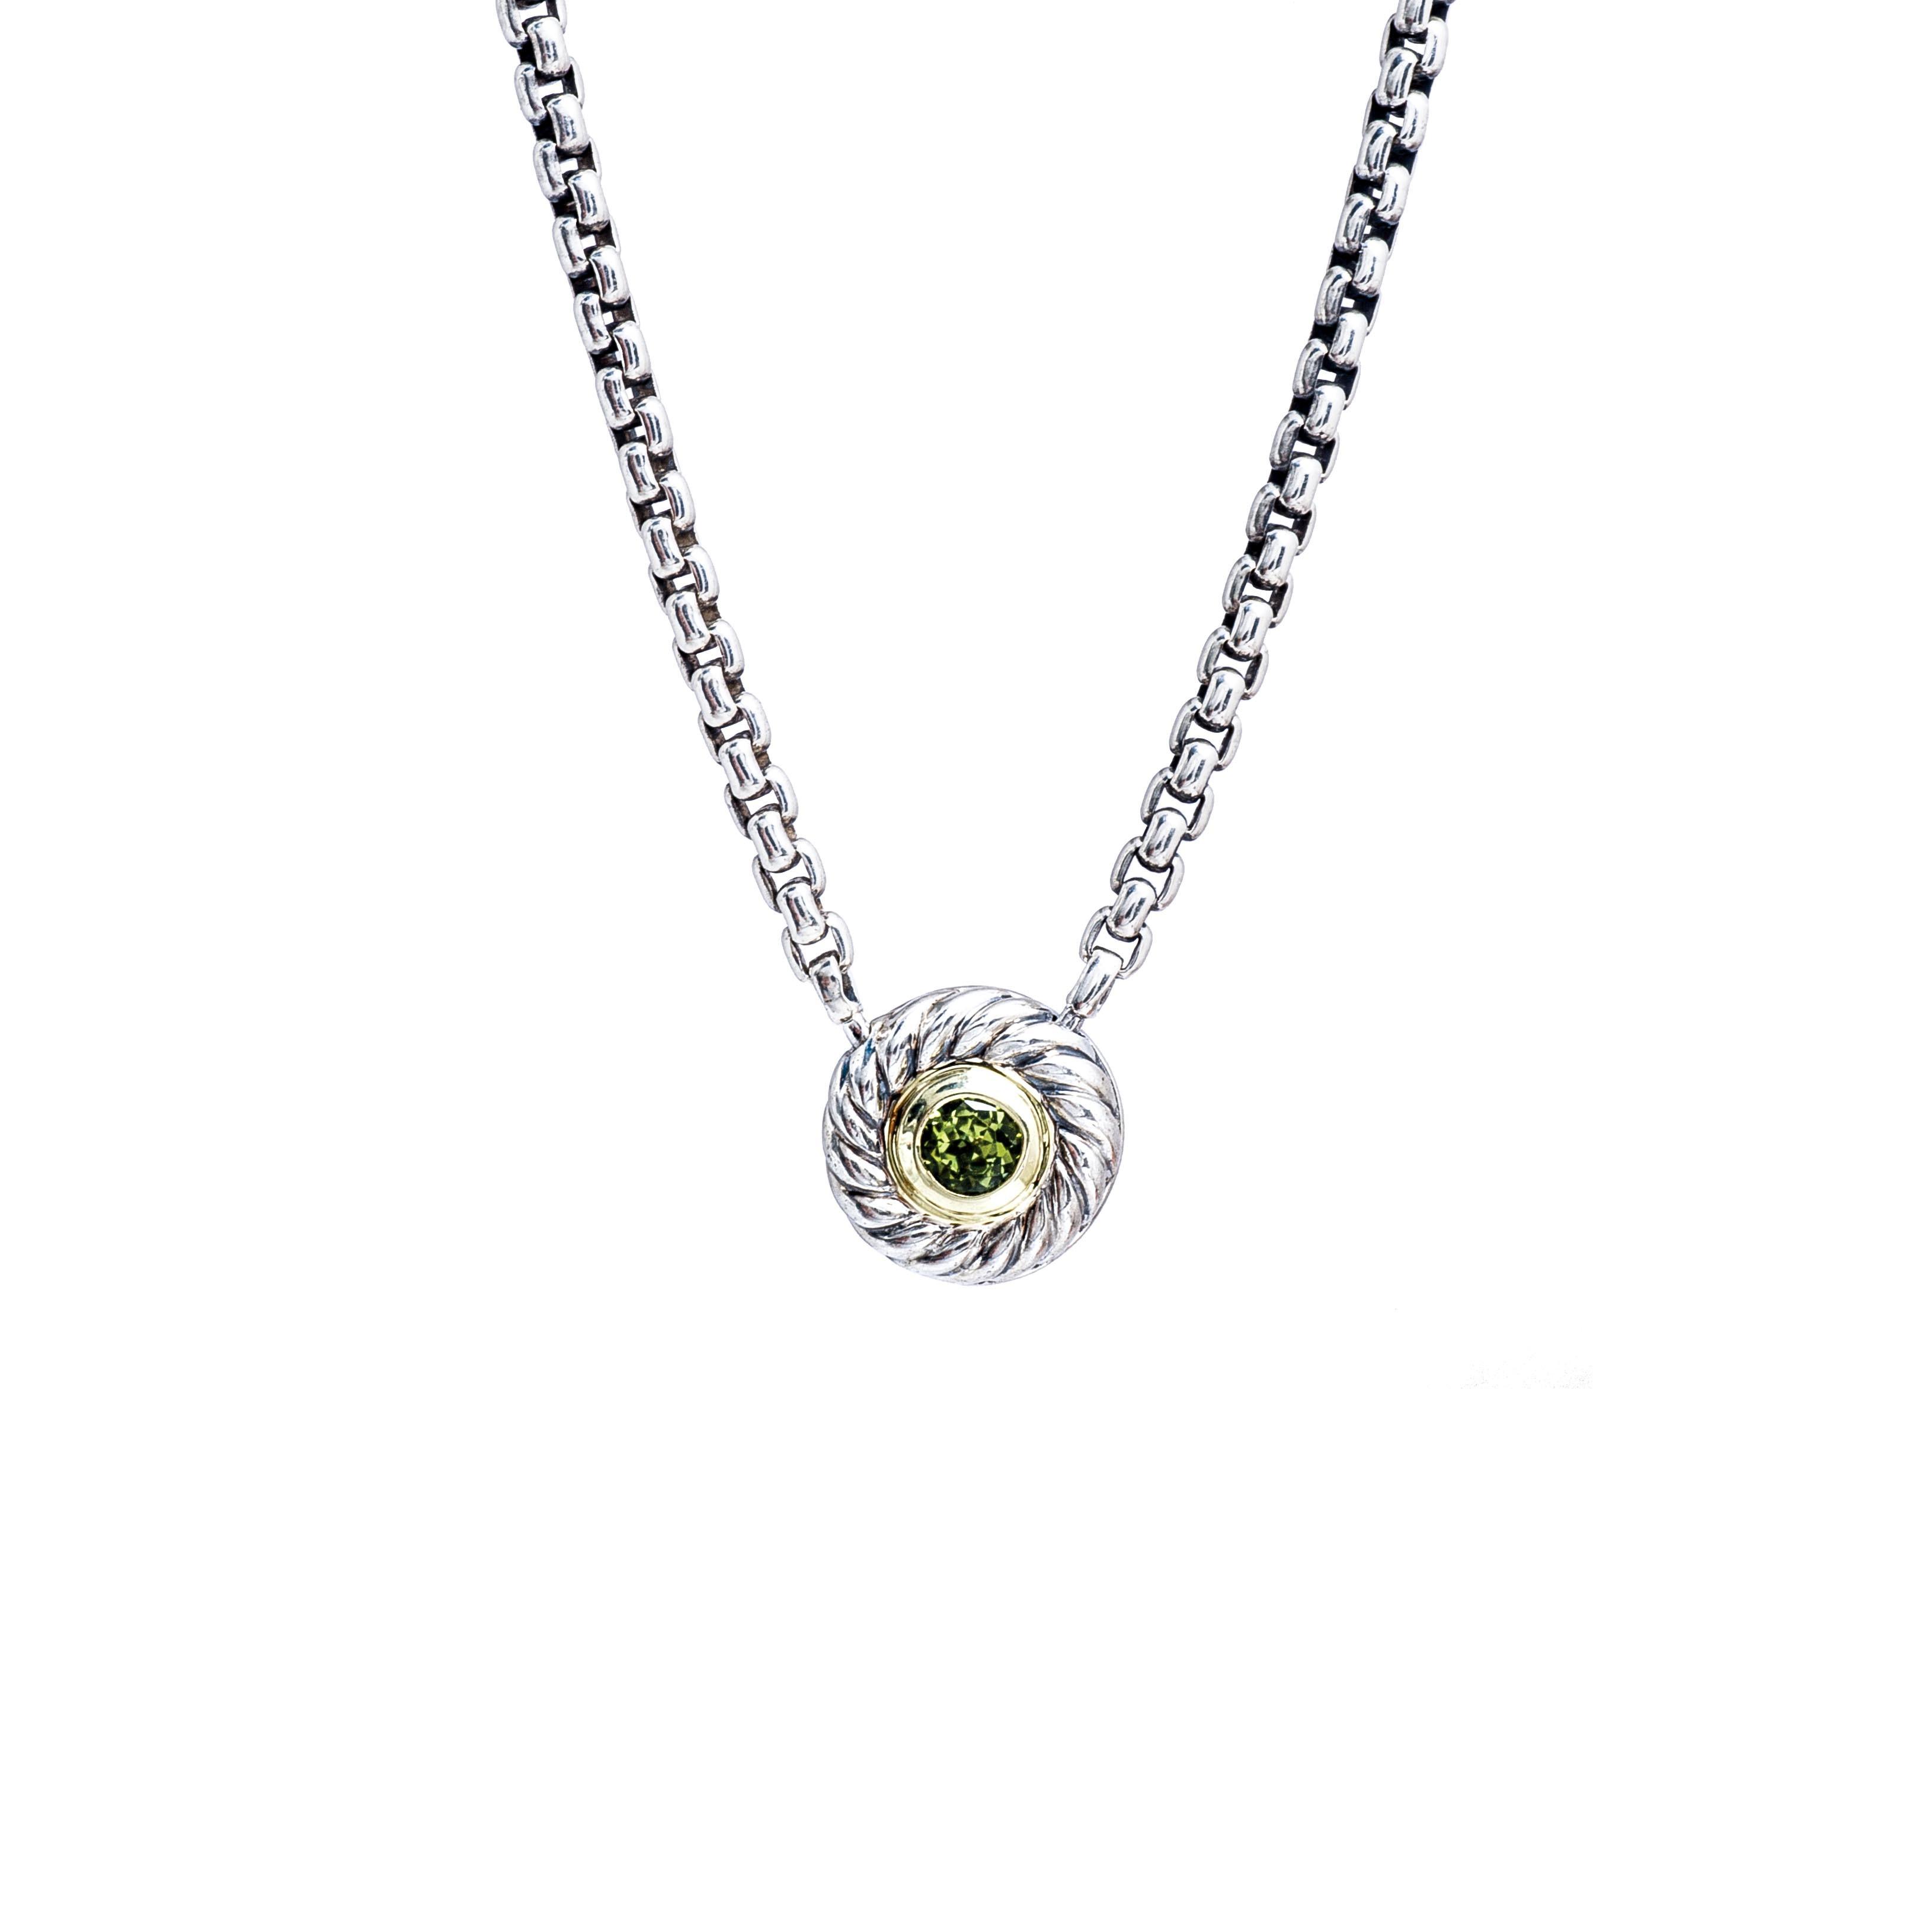 Vintage David Yurman Silver Color Classics Peridot Necklace